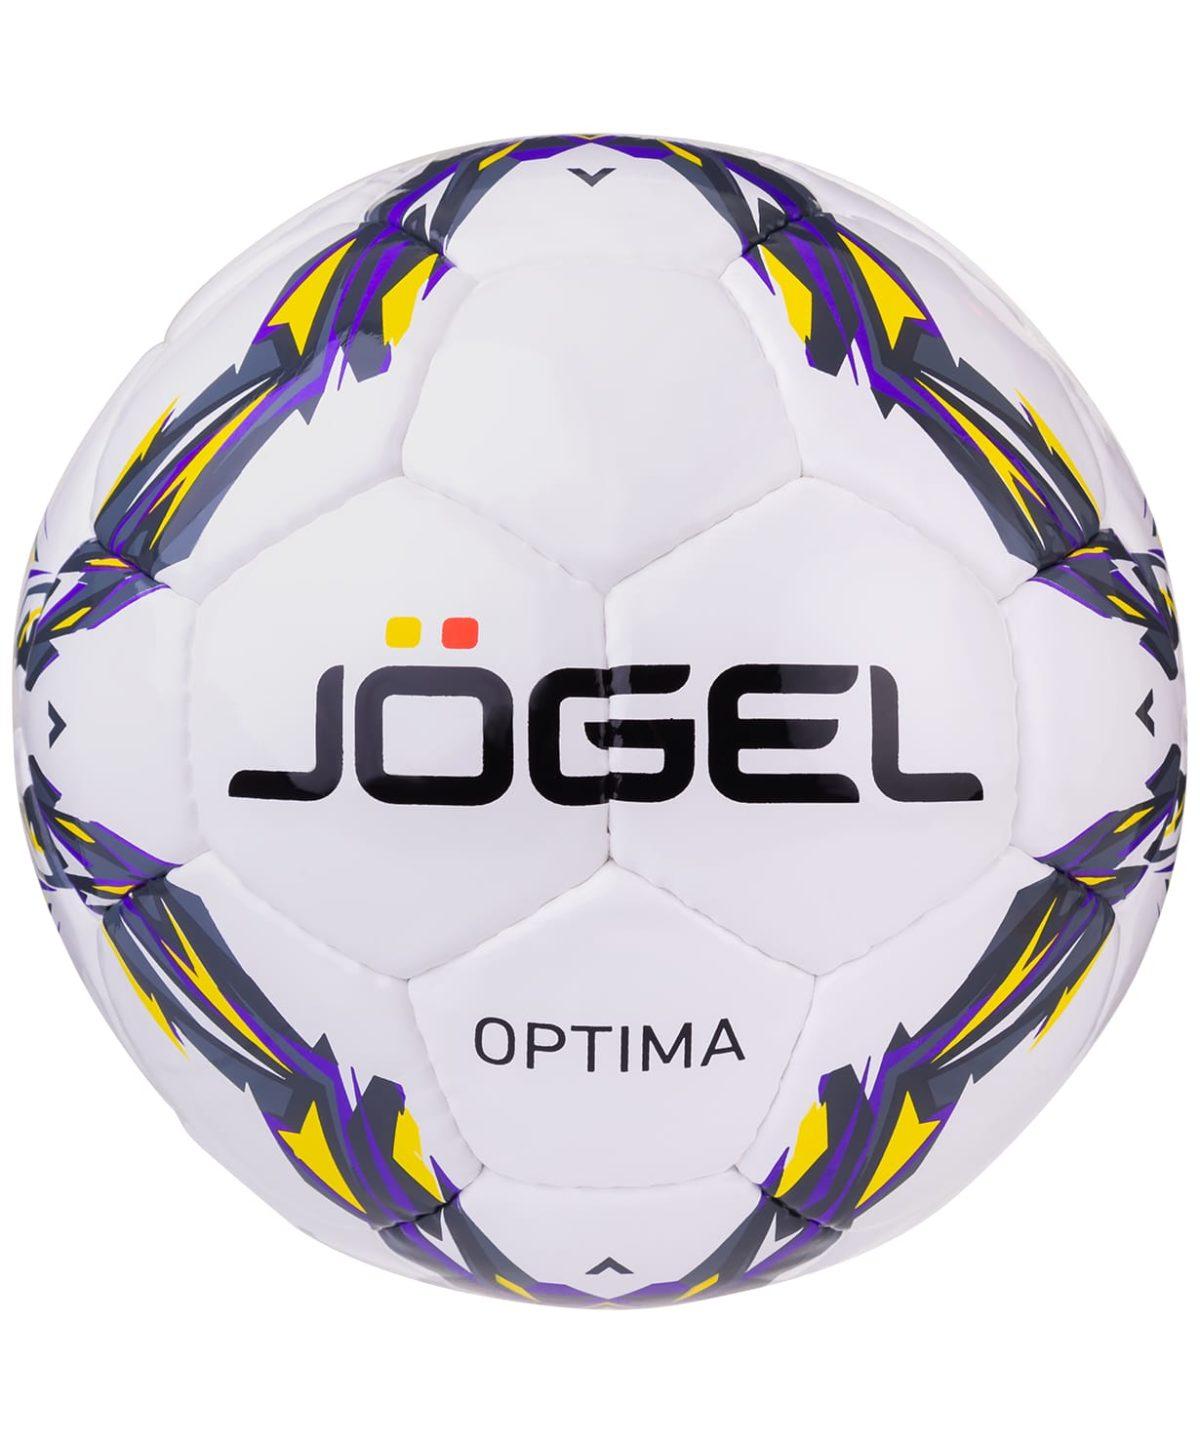 JOGEL Optima Мяч футзальный  JF-410 №4 - 1